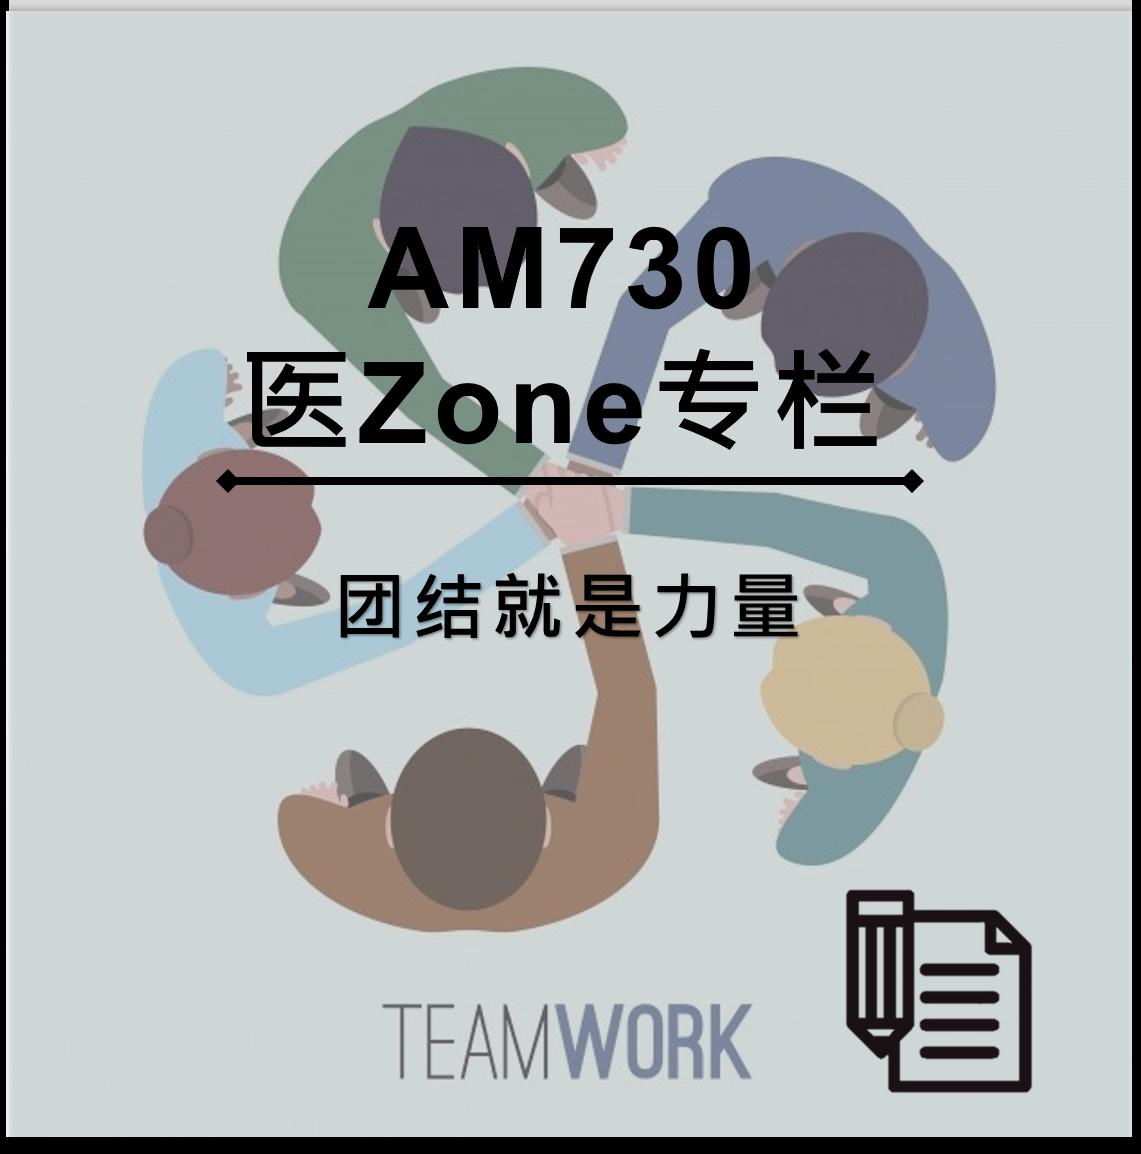 AM730 医Zone 专栏 - 团结就是力量